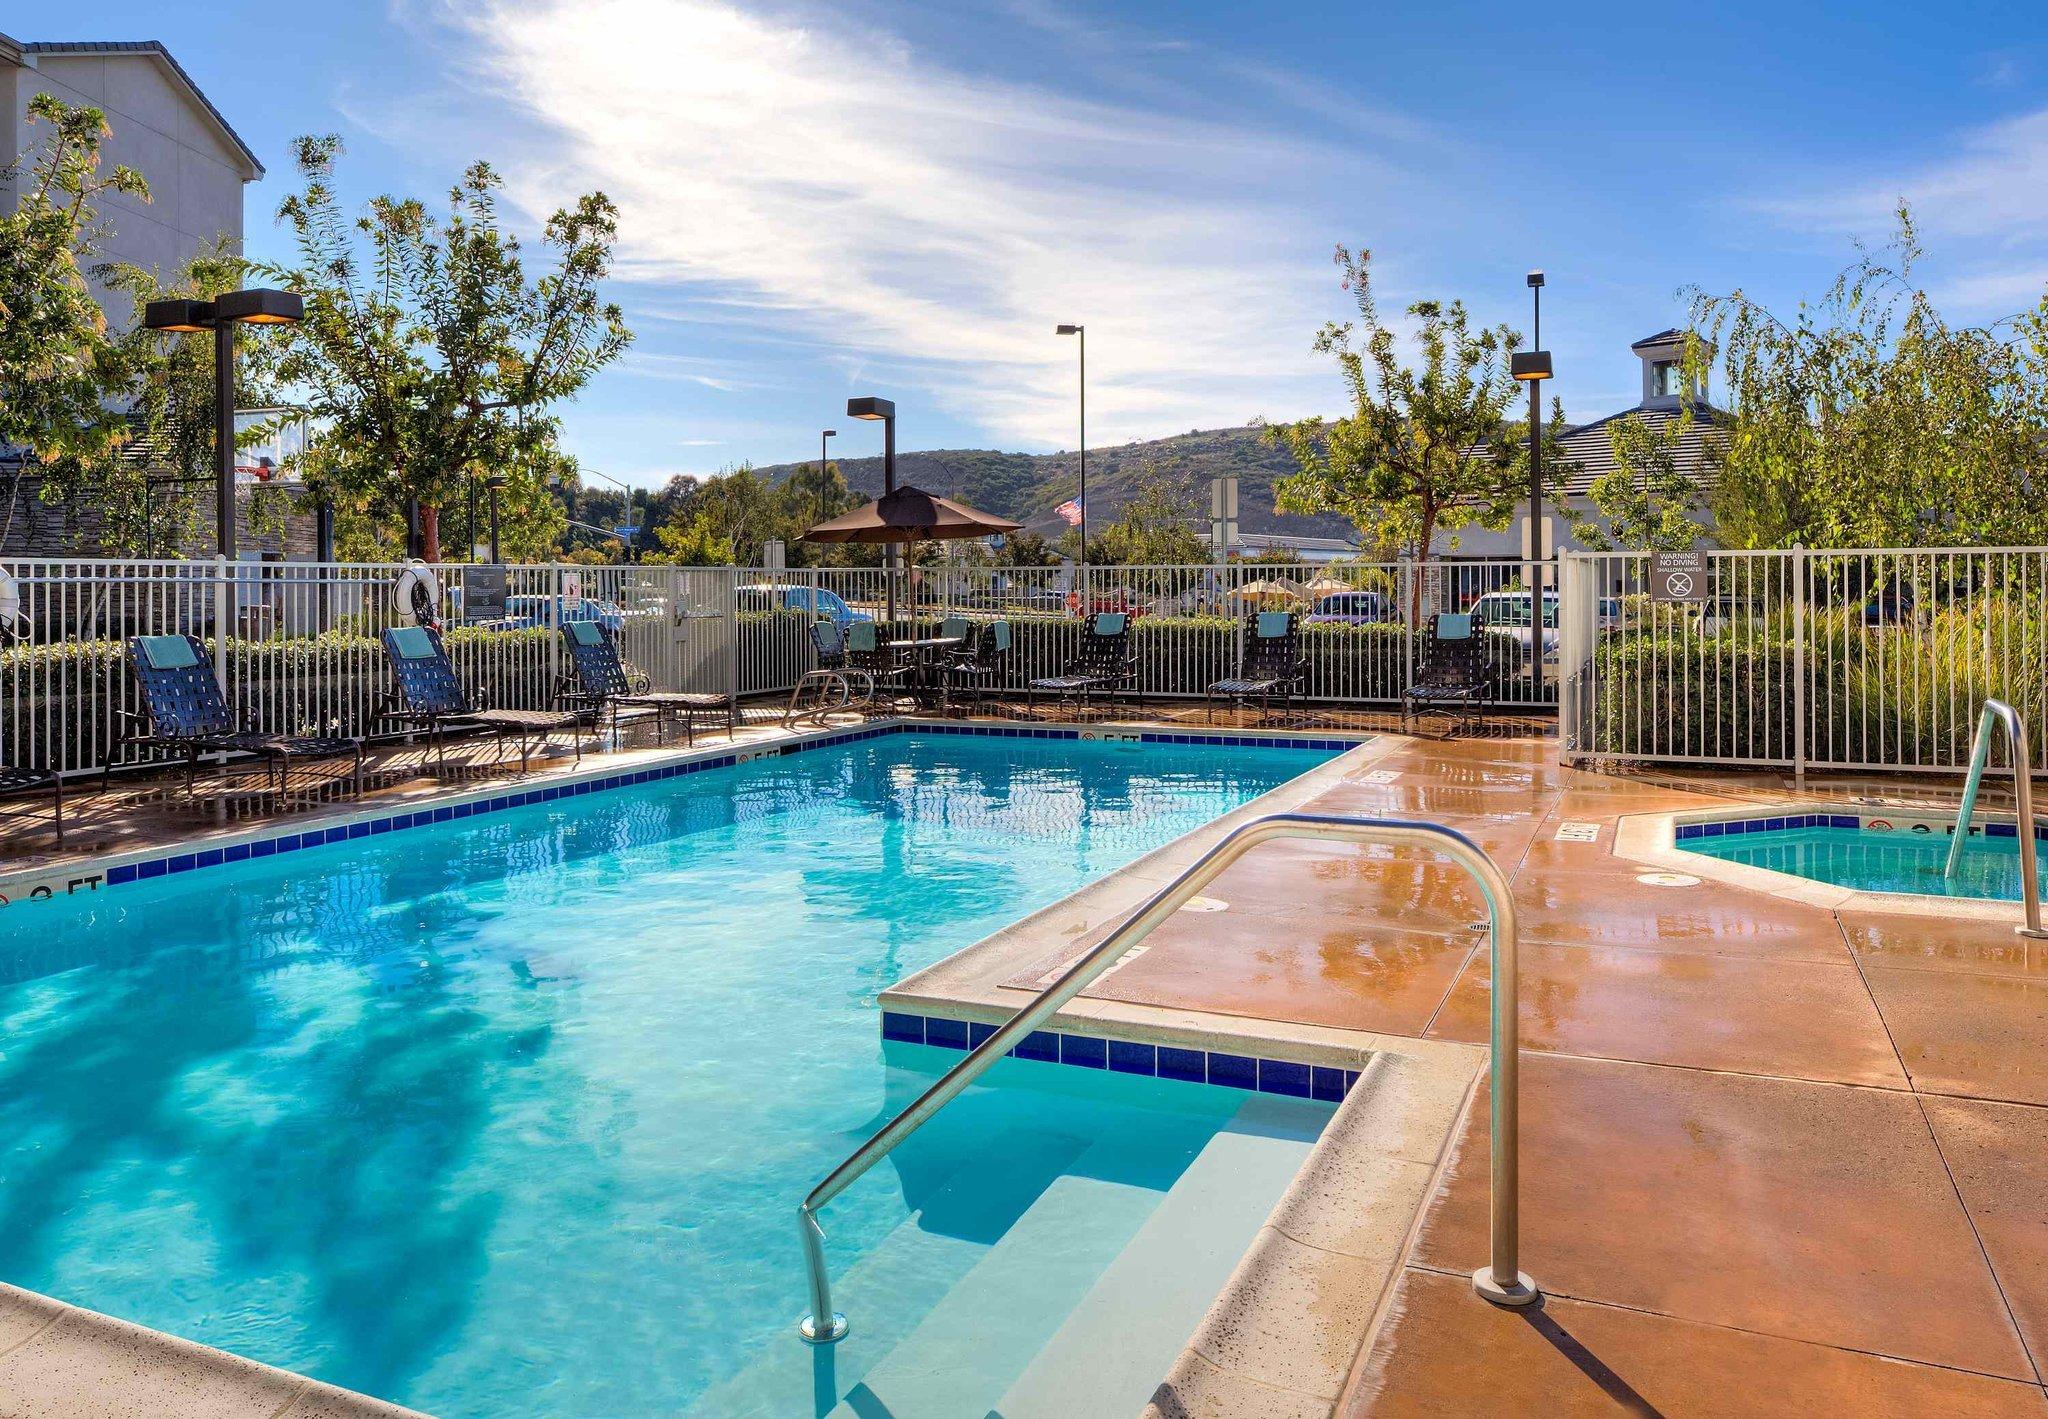 Residence Inn San Diego Rancho Bernardo/Scripps Poway